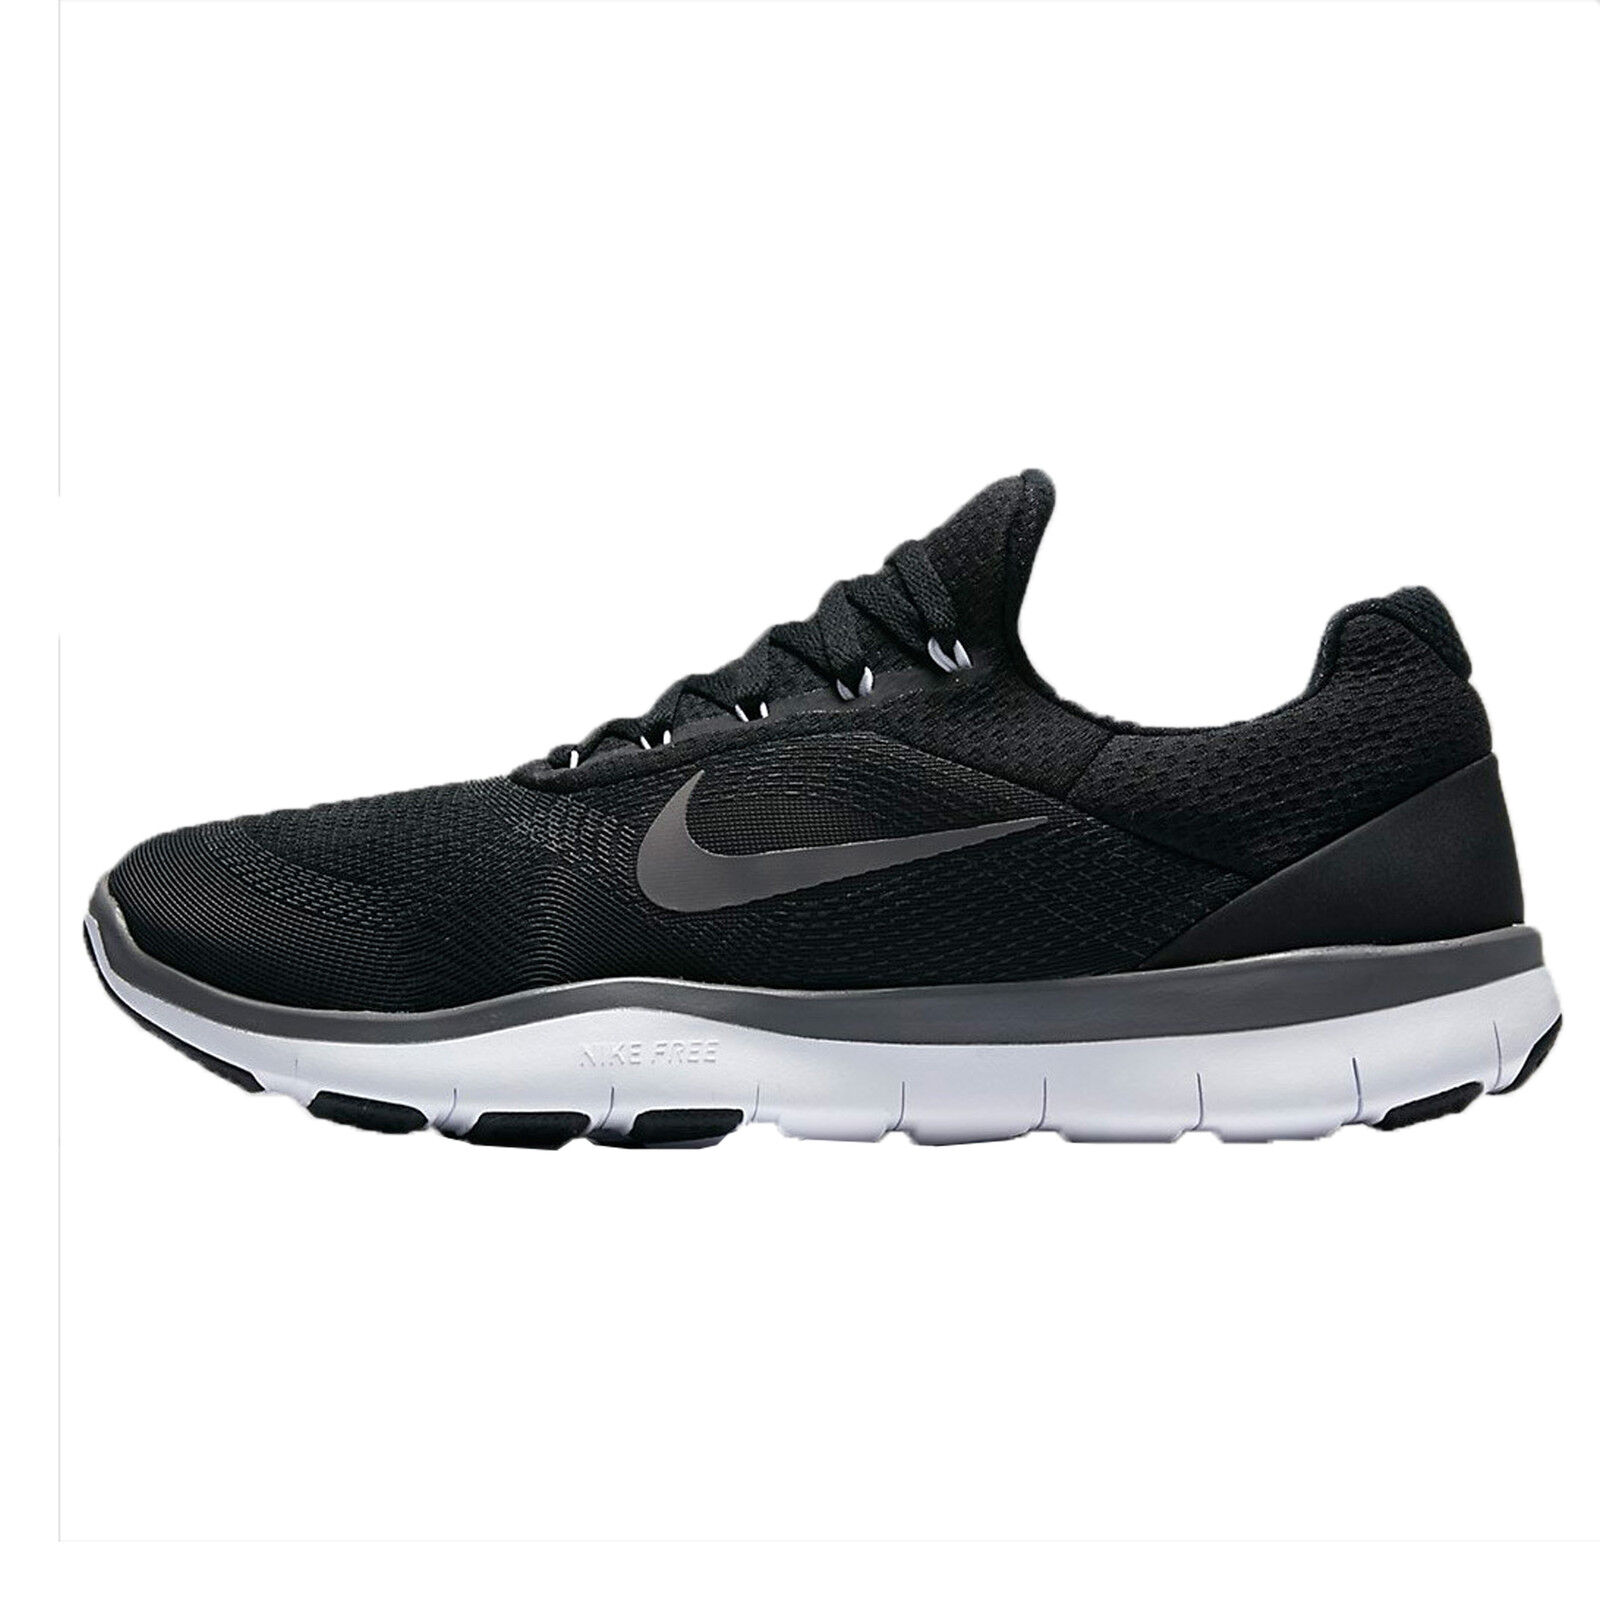 Nike Free Trainer Sportschuh V7 898053-003 Sportschuh Trainer Sneaker Training 6643f8